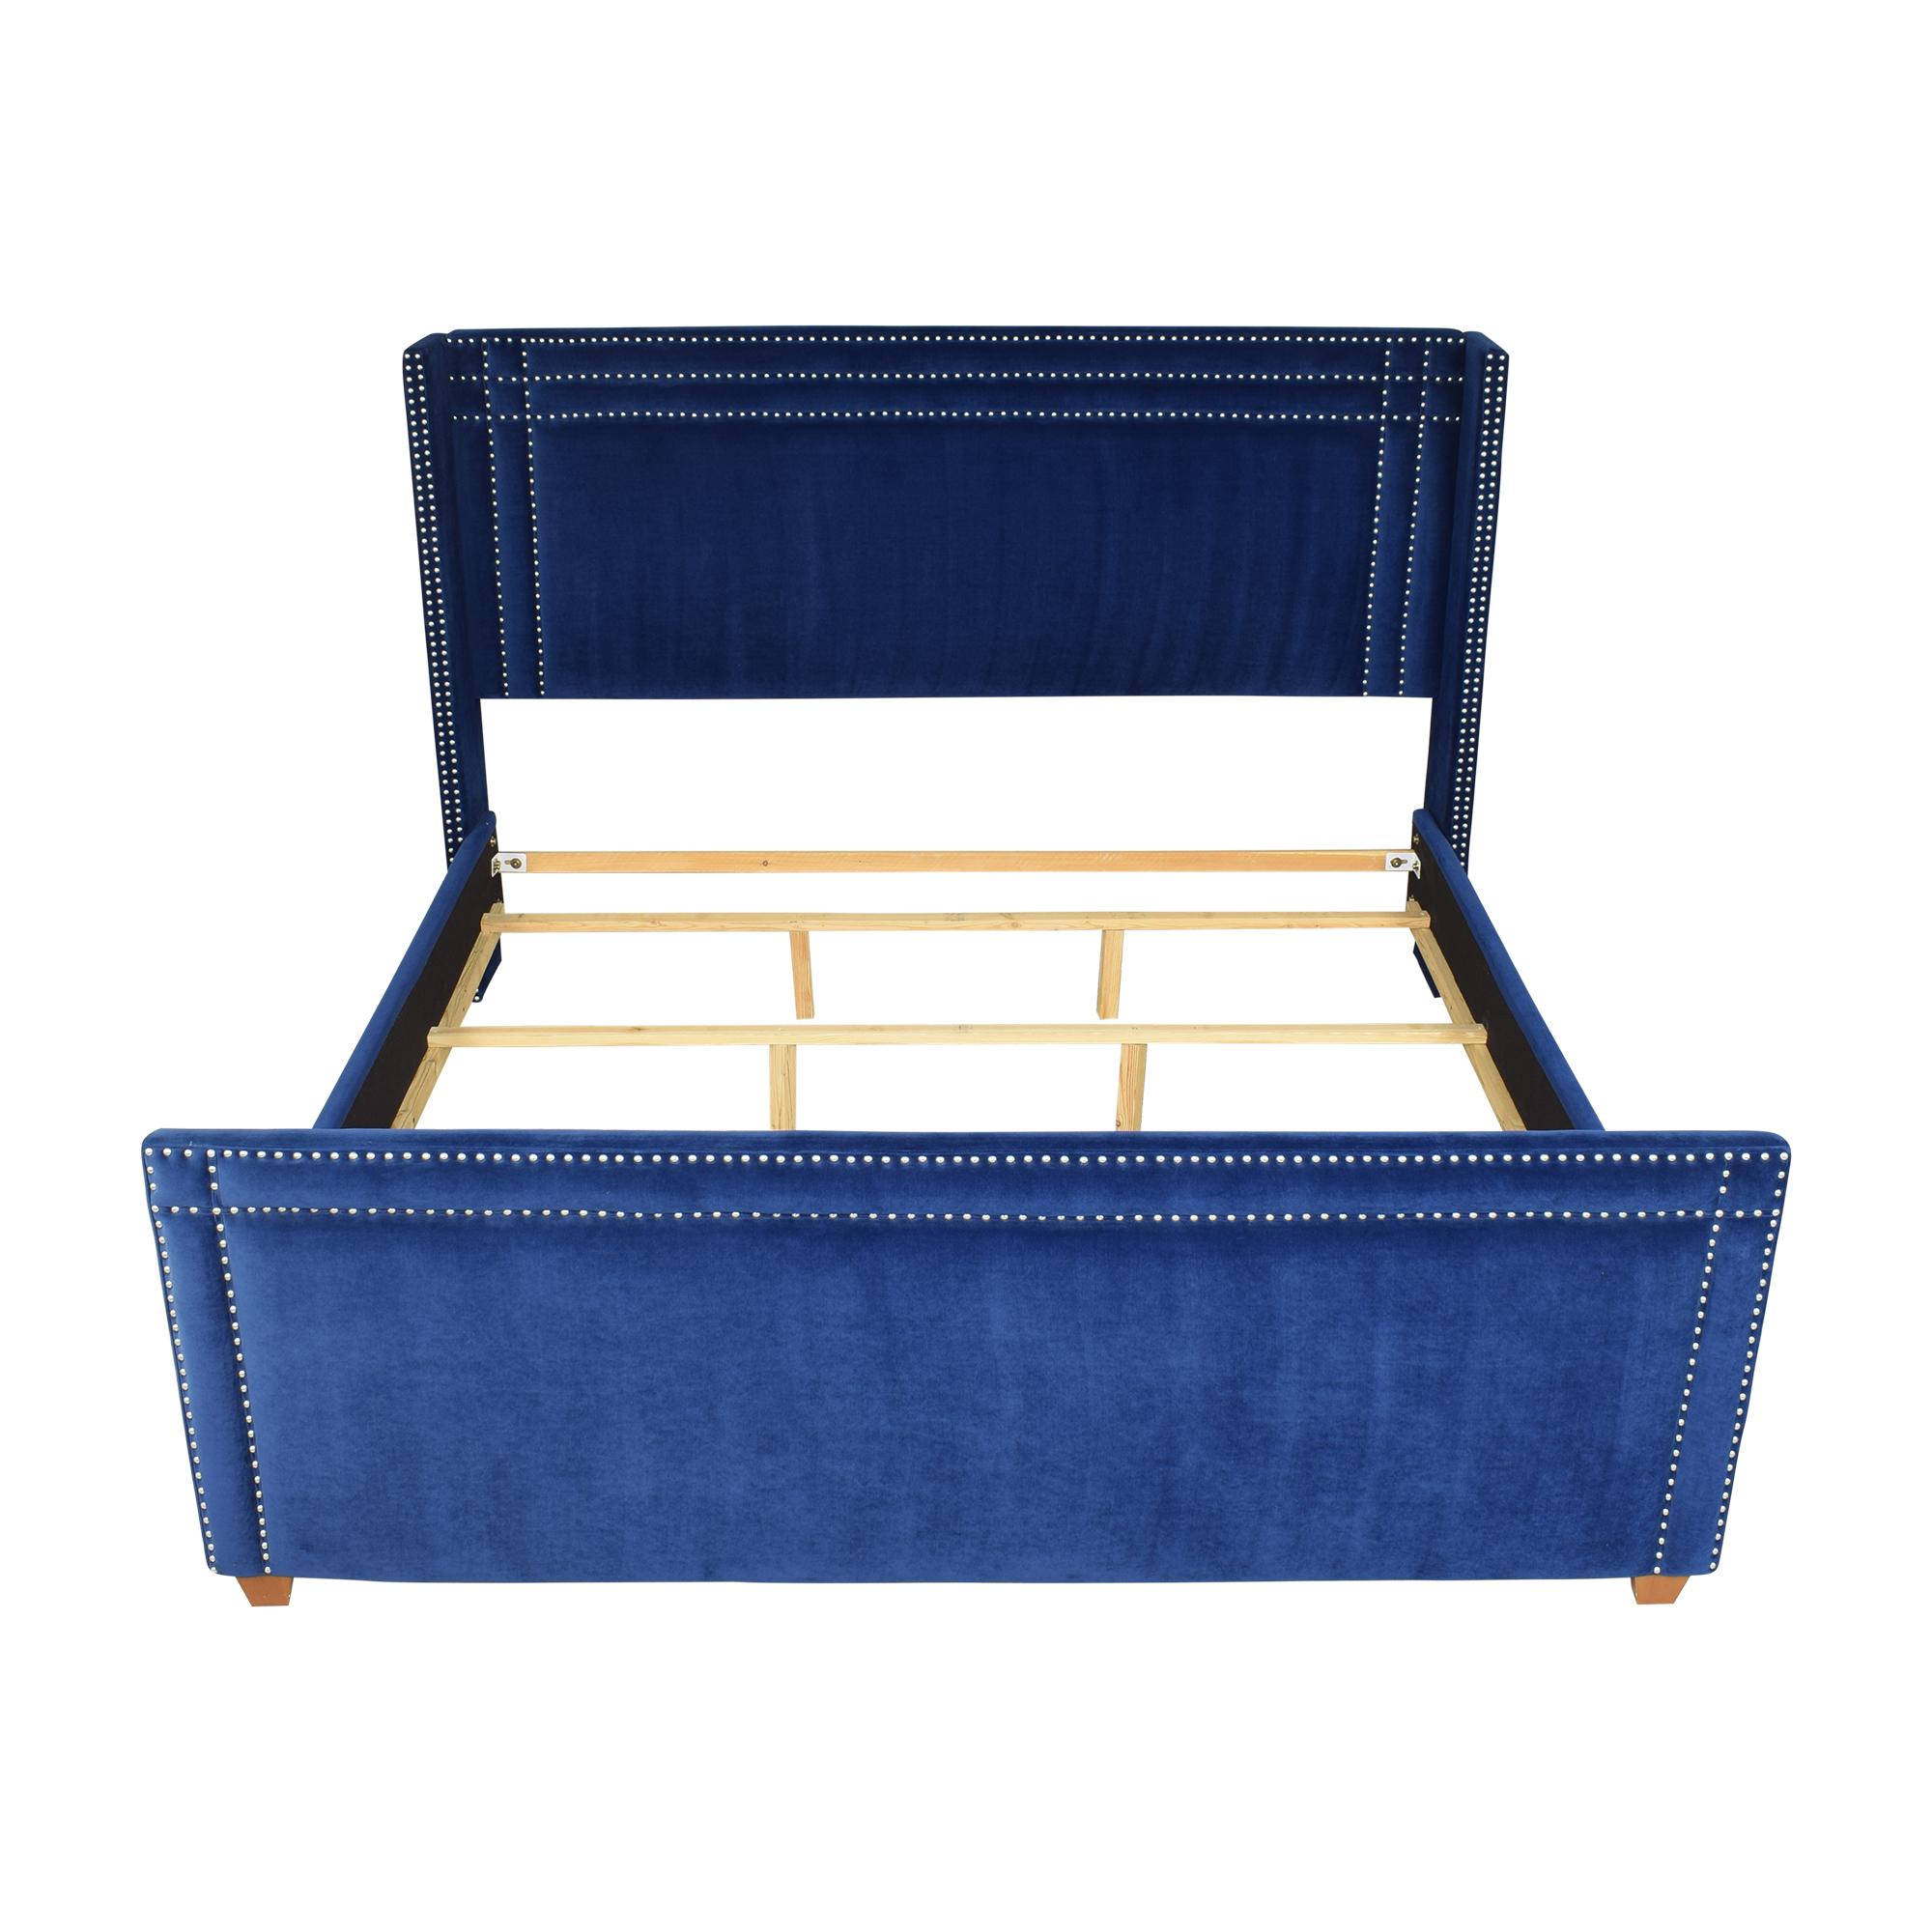 Wayfair Wayfair Willa Arlo Interiors Janna Upholstered Low Profile King Bed nj